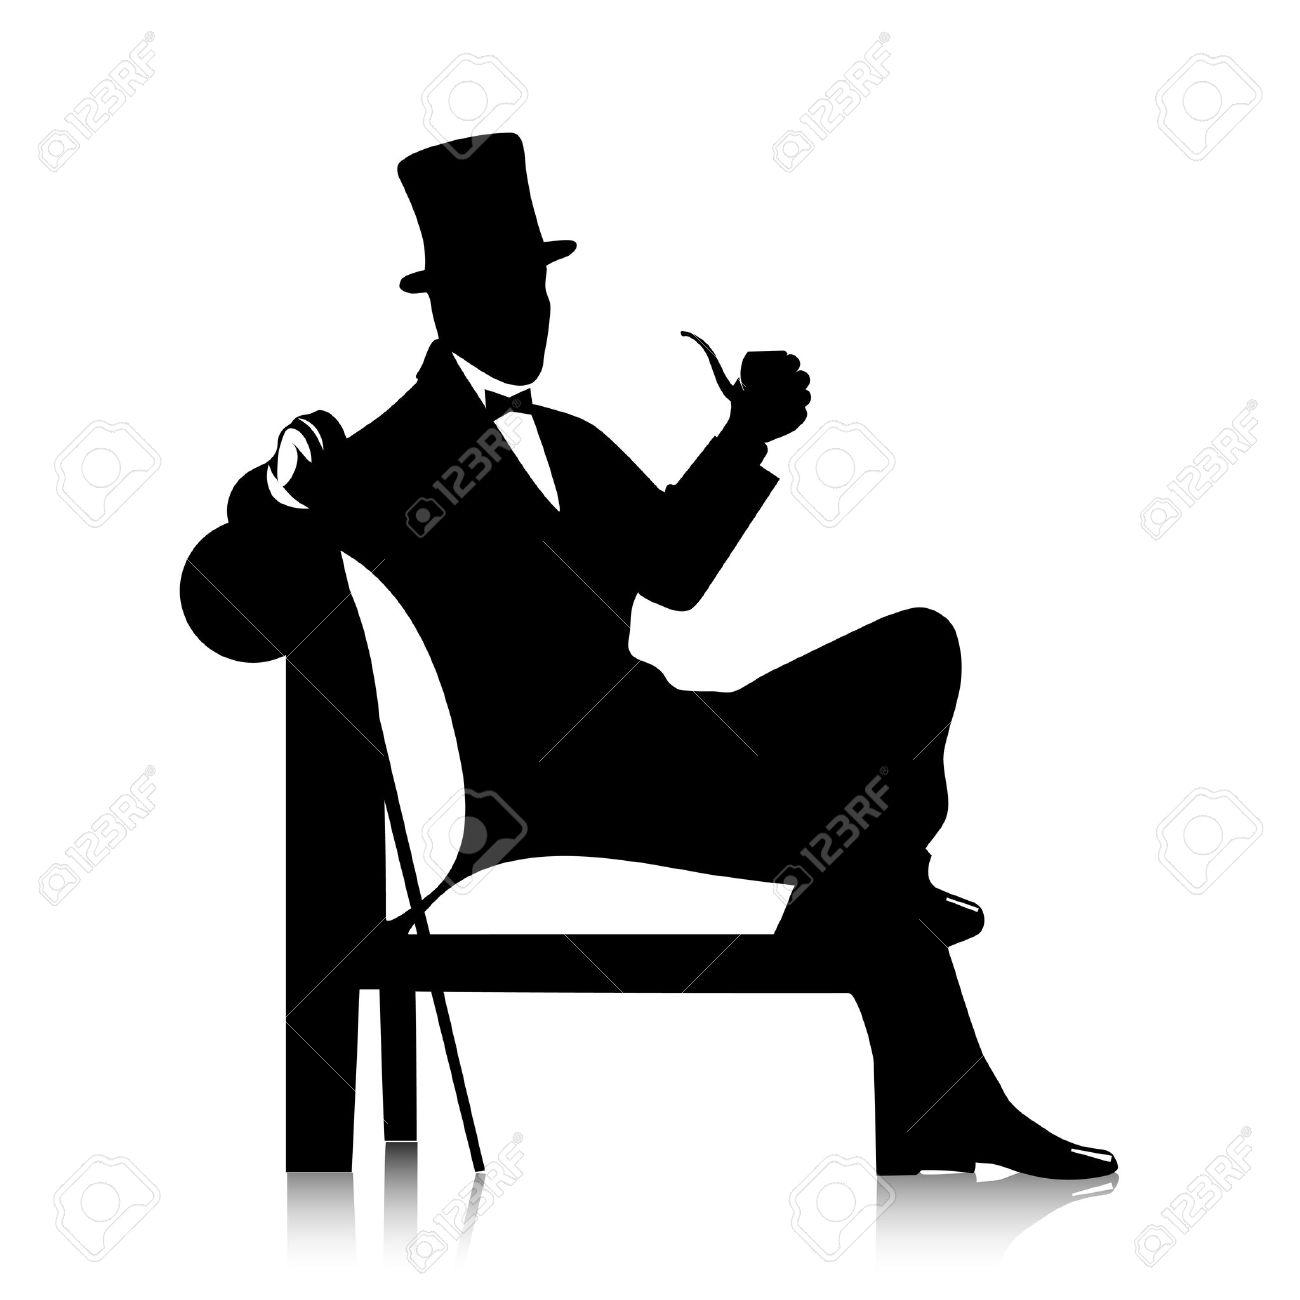 87 205 gentleman stock illustrations cliparts and royalty free rh 123rf com victorian gentleman clipart english gentleman clipart